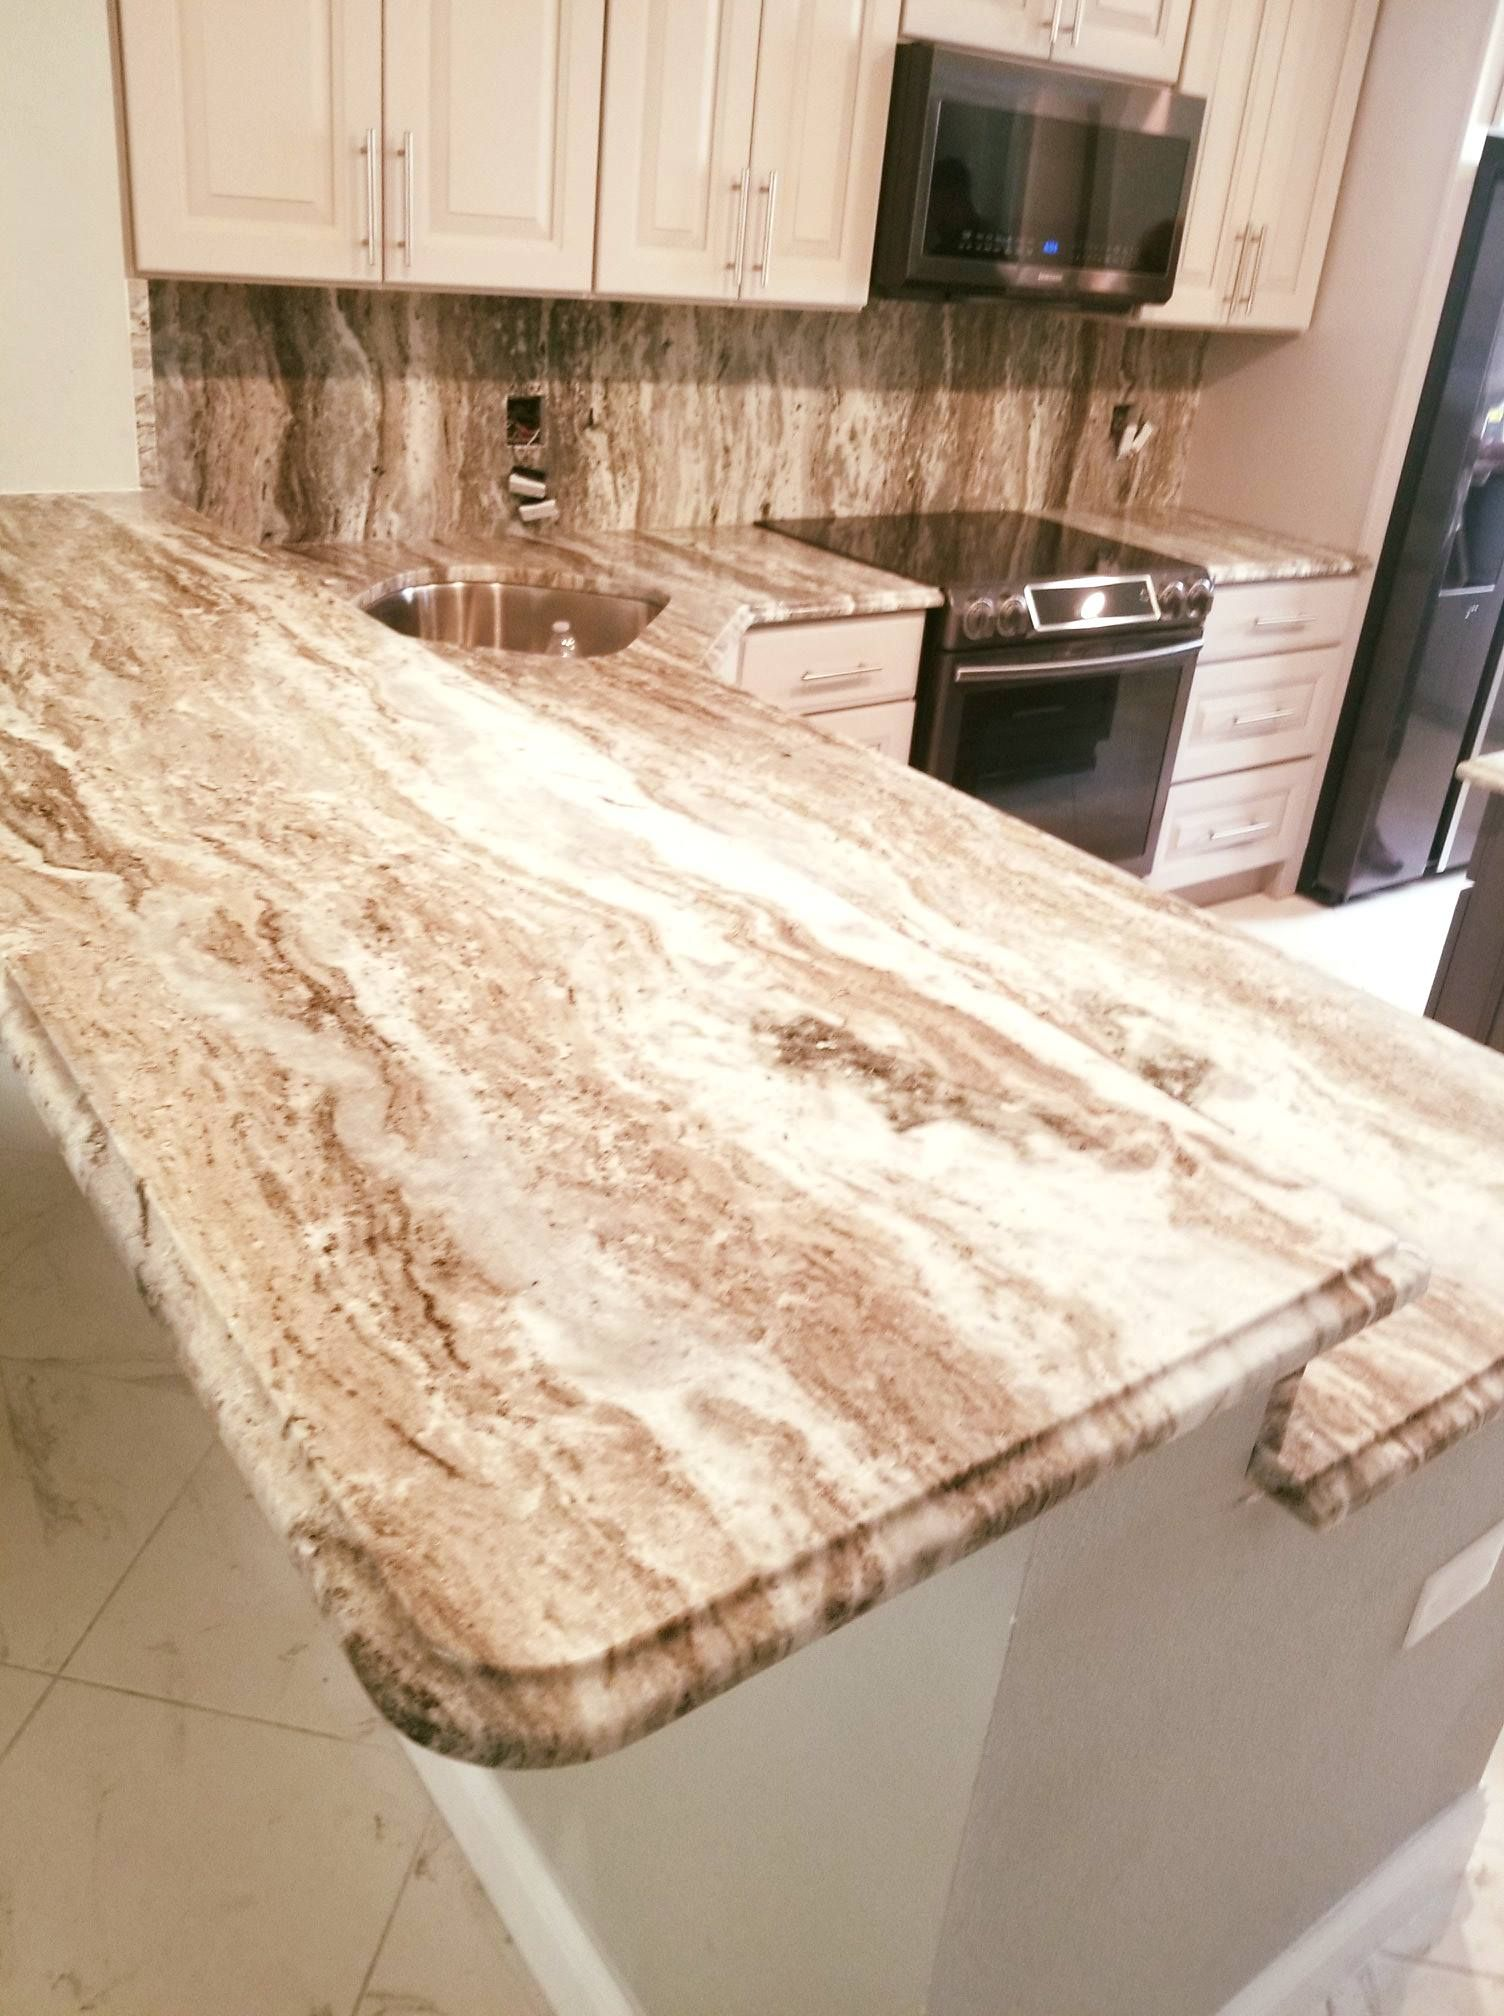 Amazing custommade kitchen countertop designed